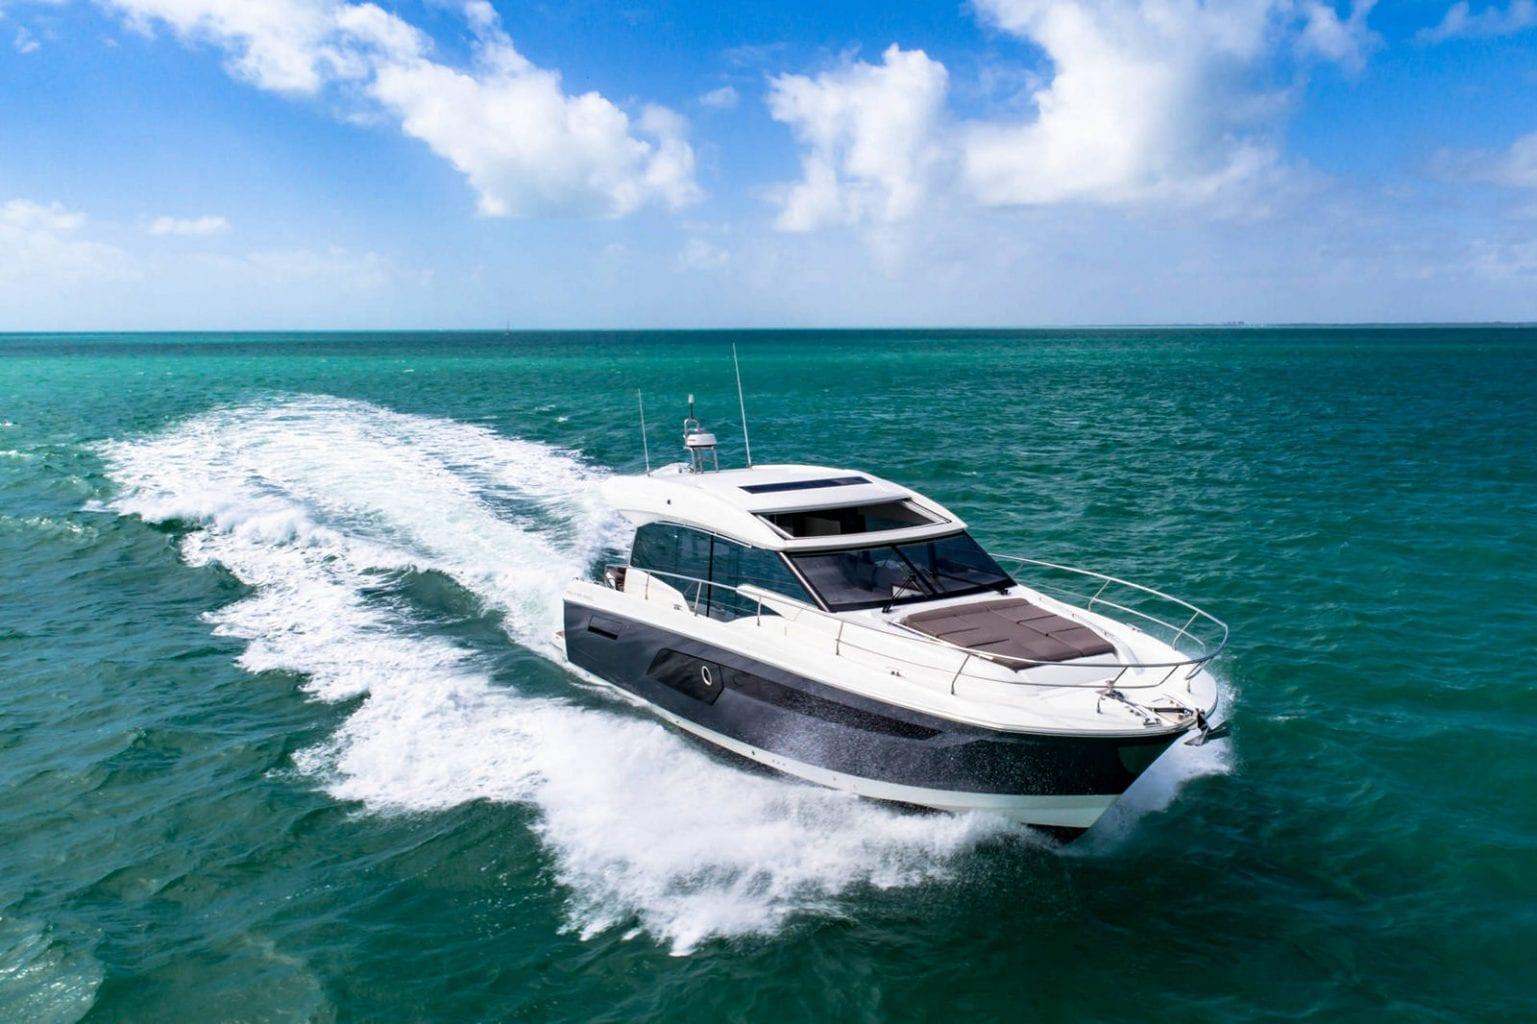 יאכטה Prestige 520 Sport - SPORT-LINE PRESTIGE 520S - Stream Yachts